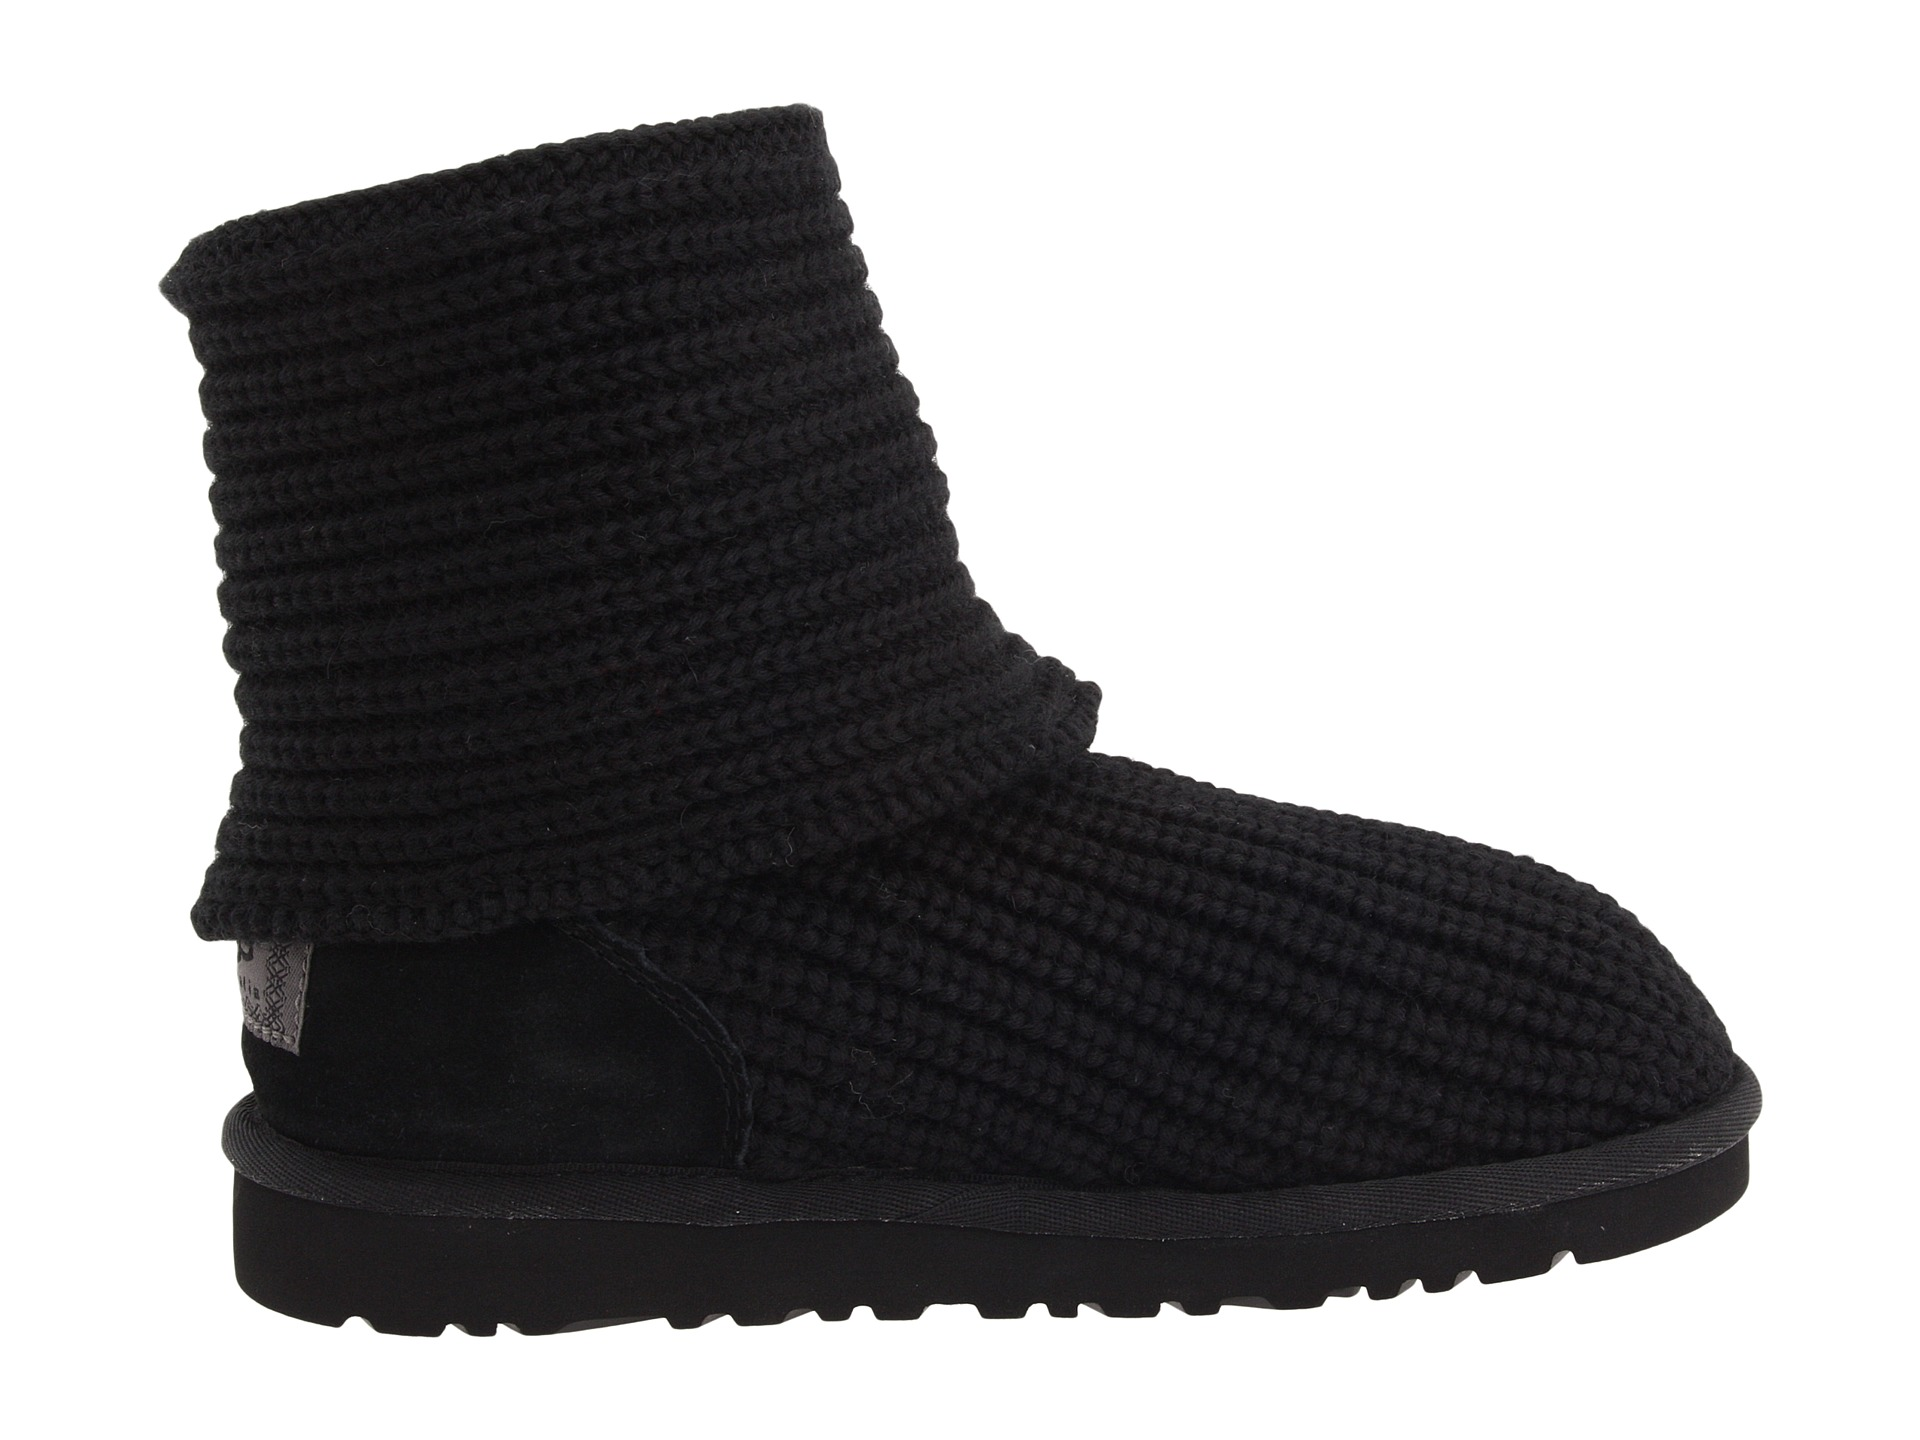 kensington ugg boots uk size 7